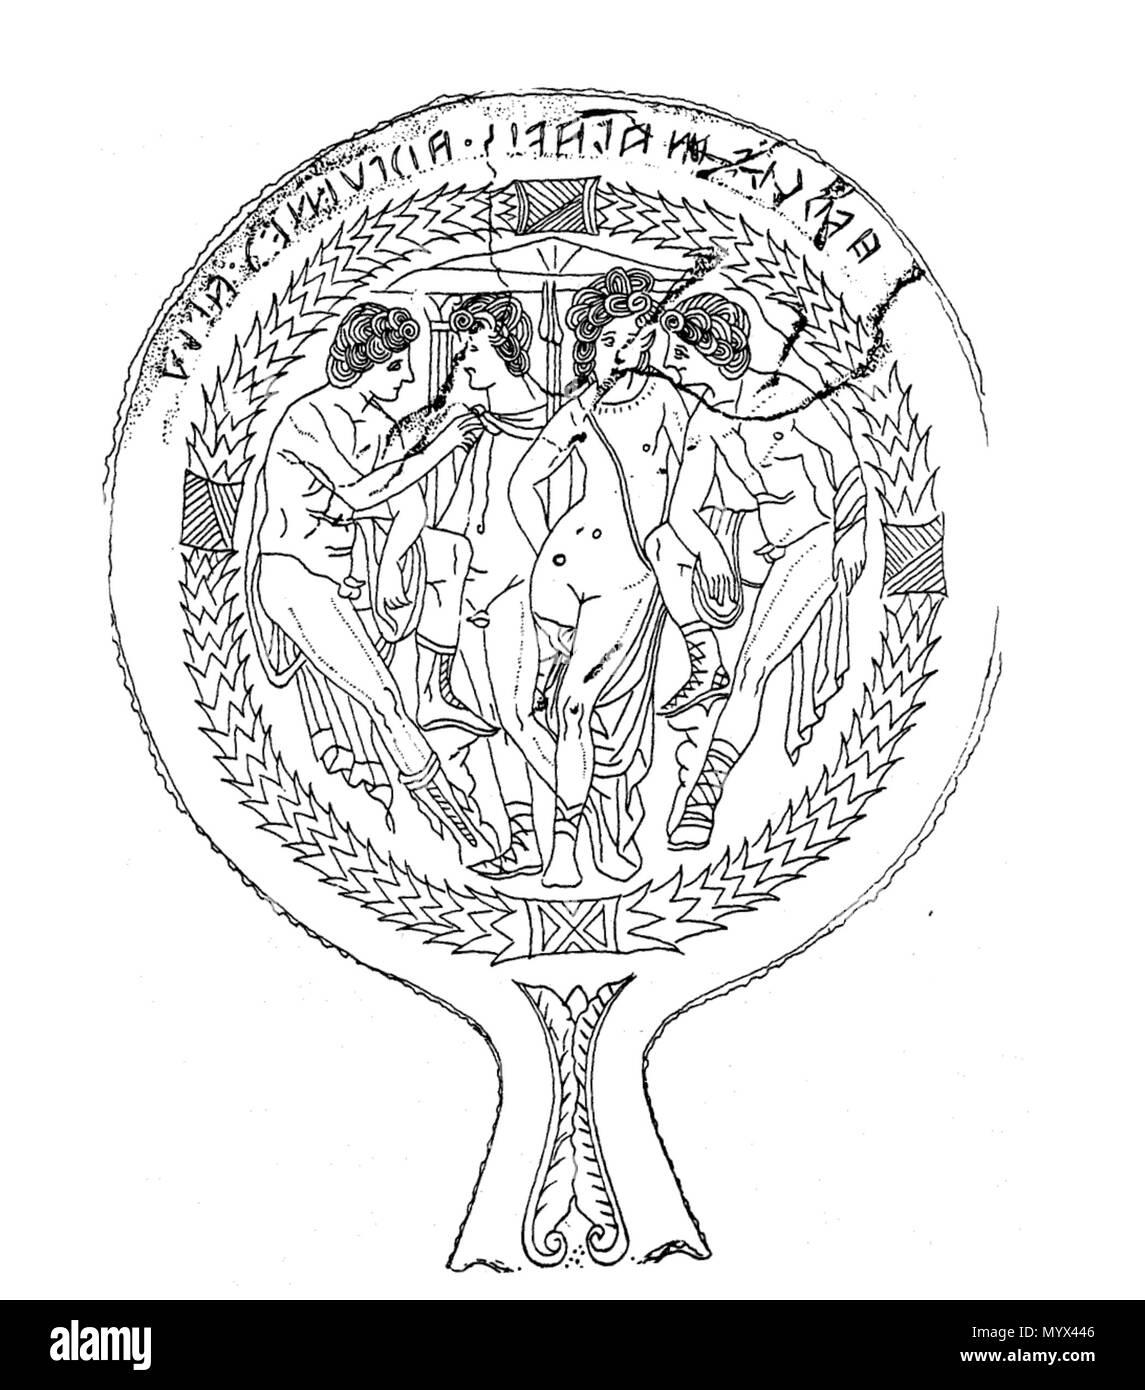 . Inglés: espejo de bronce etrusca de Tarquinia. Museo Nacional de Copenhague, Dinamarca. Tercer siglo AEC. 31 espejo de bronce etrusca de Tarquinia. Copenhague, Dinamarca Museo Nacional Foto de stock